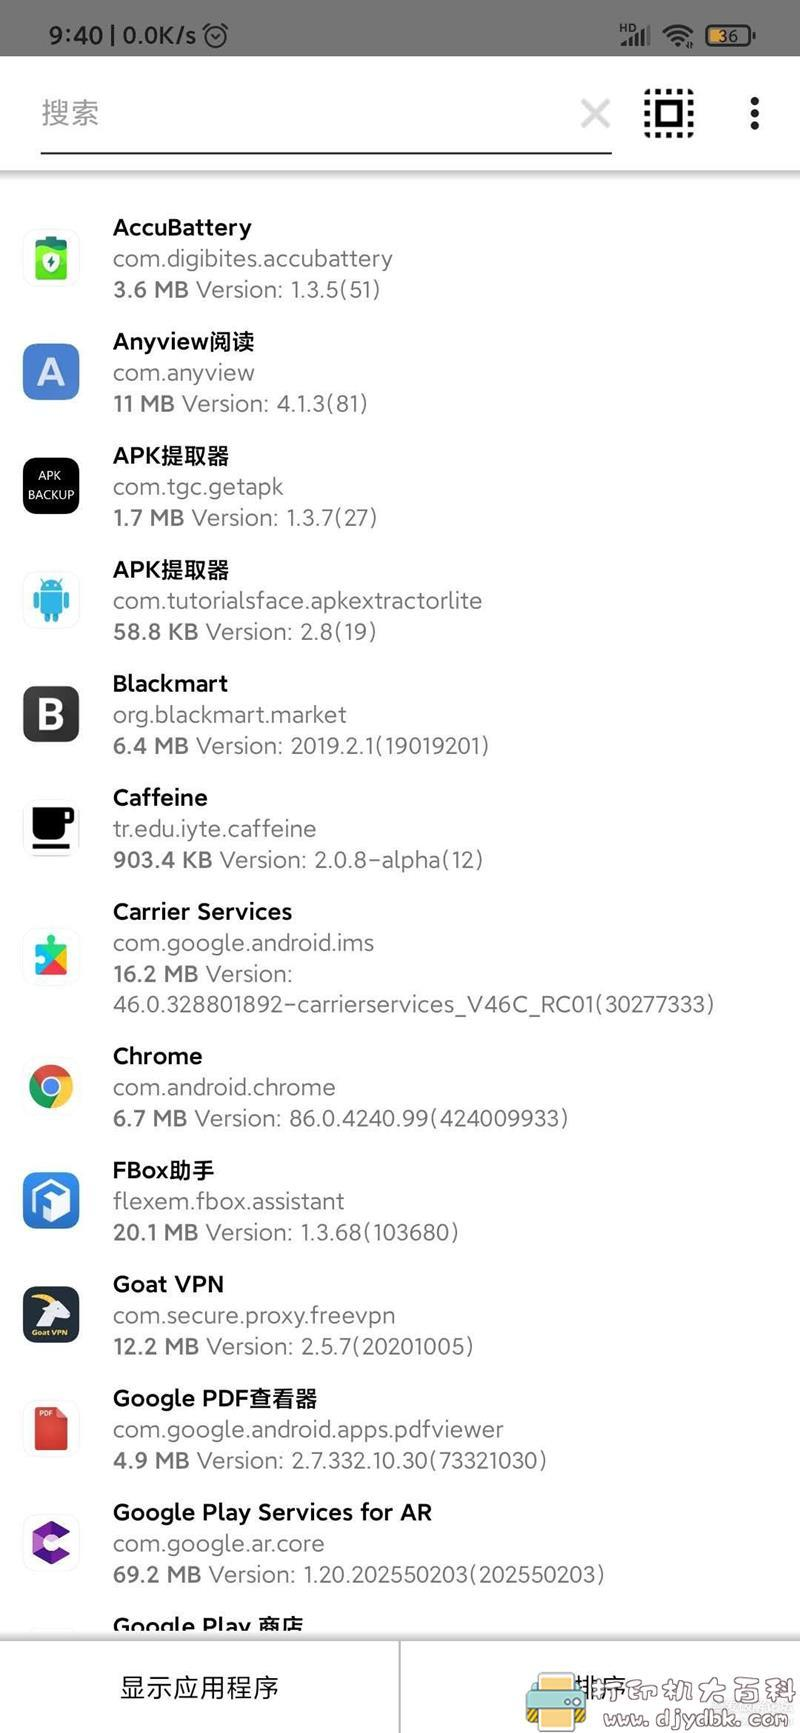 [Android]安卓APK提取器_com.tutorialsface.apkextractorlite_19_2.8,可提取手机自带应用图片 No.4